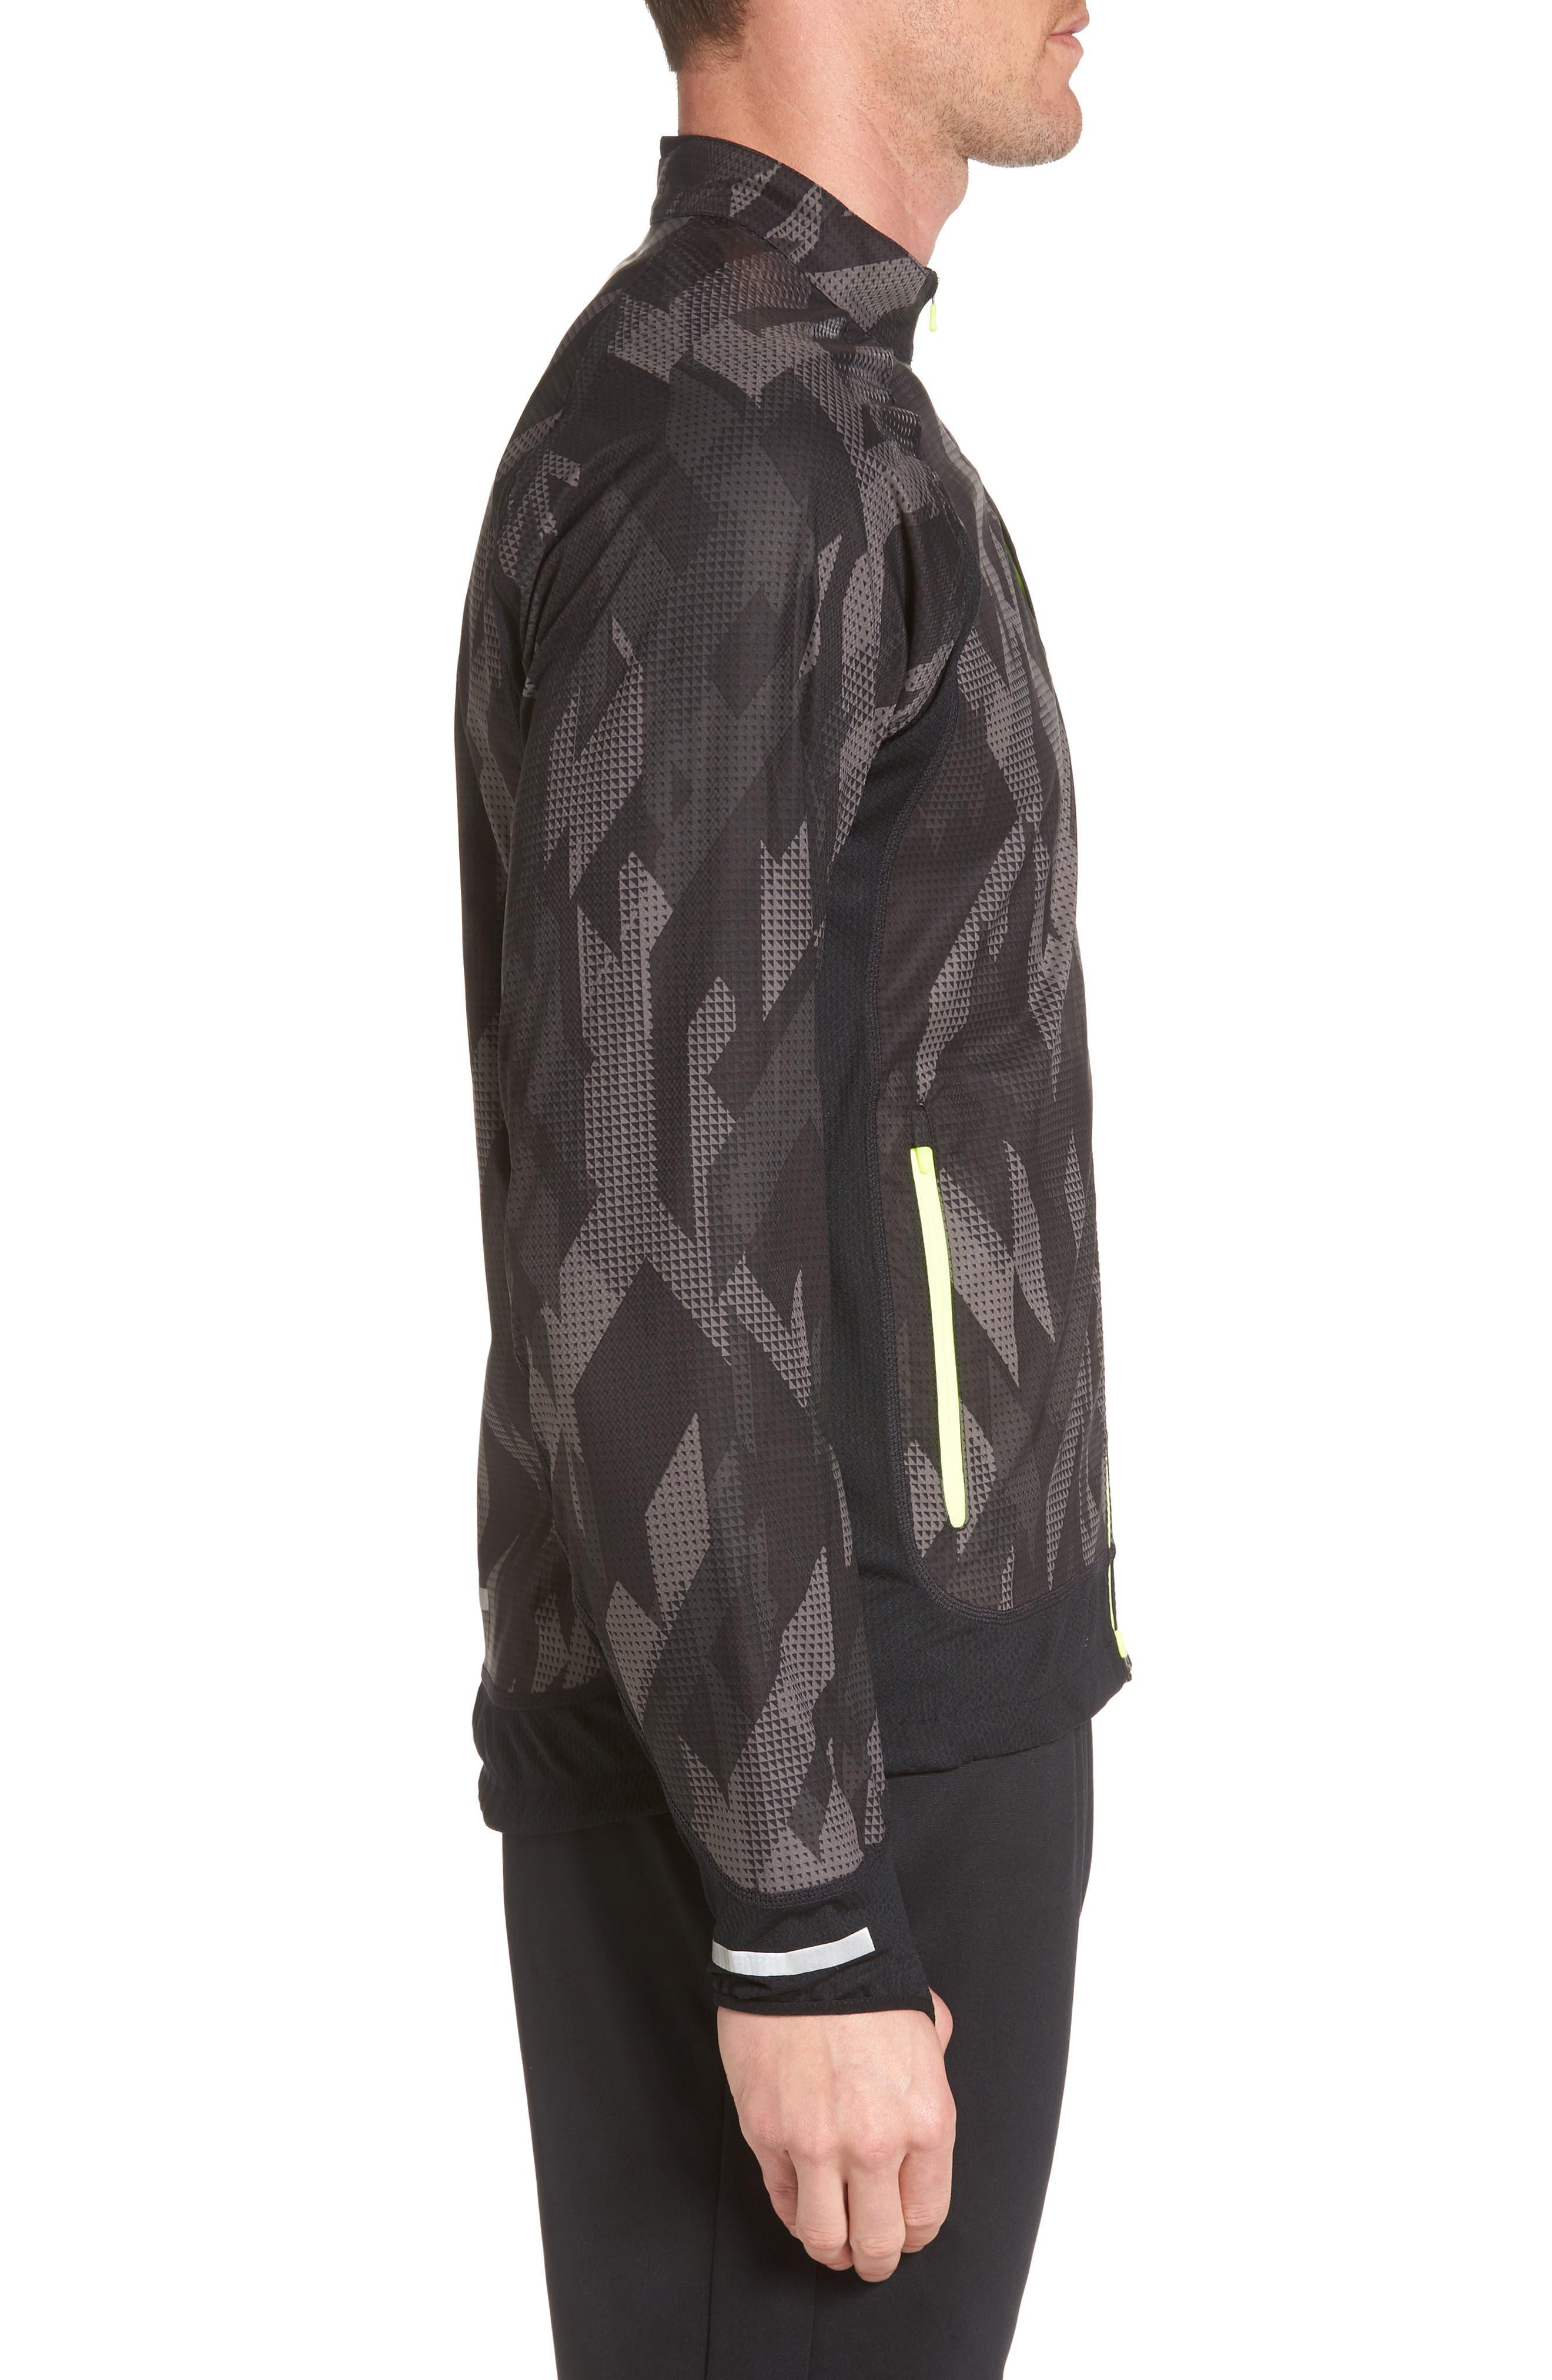 Flex Running Jacket,                             Alternate thumbnail 2, color,                             Black/ Black/ Volt